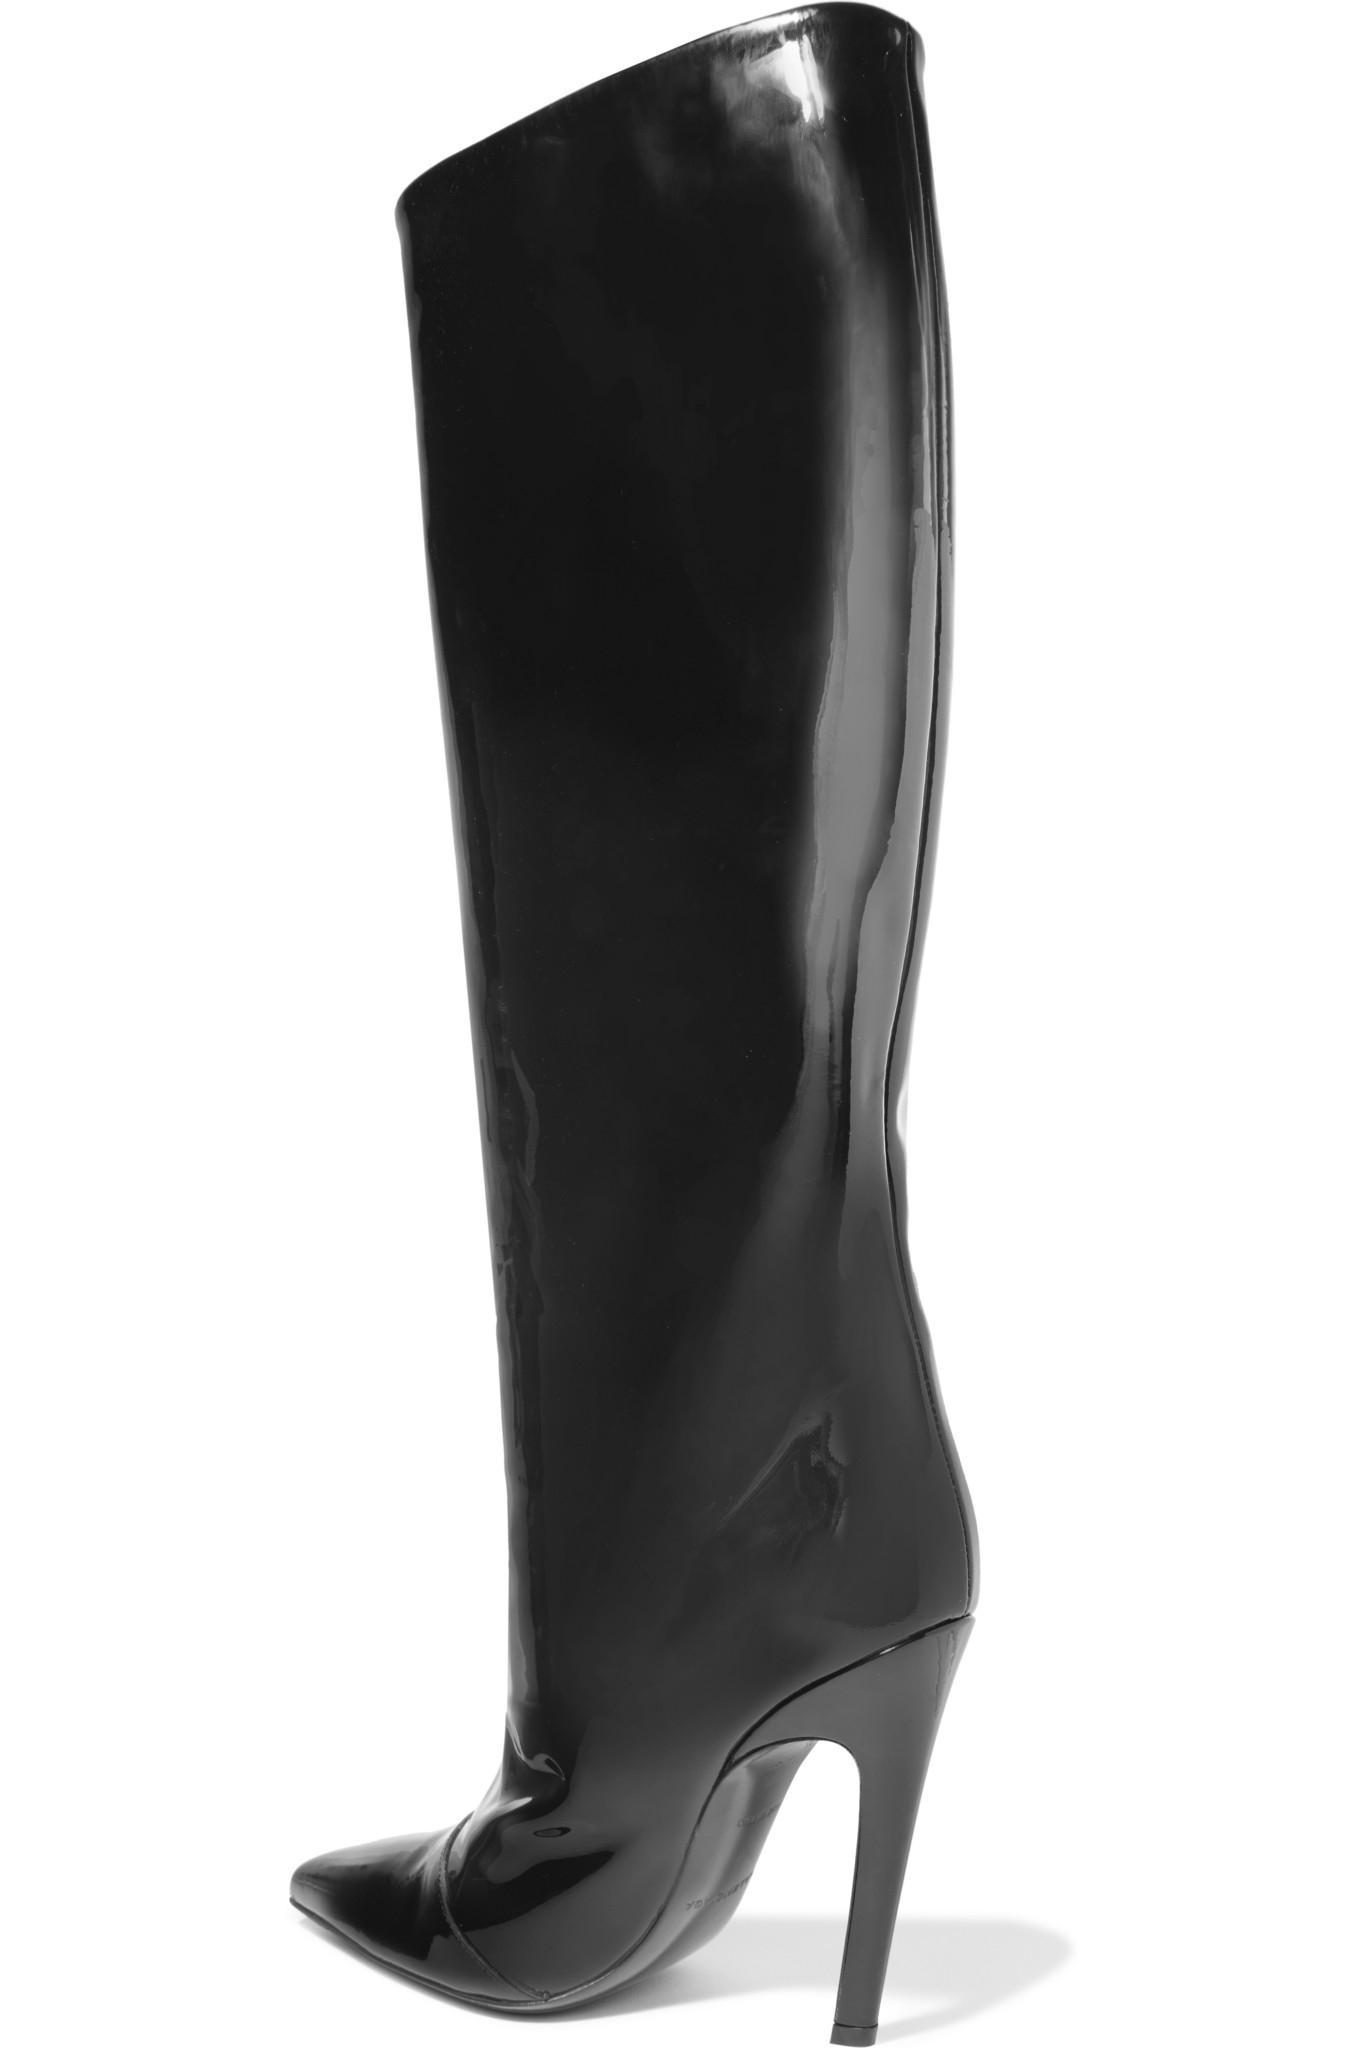 9d74c4a8a6151 Balenciaga Unit Leather Biker Ankle Boot in Black